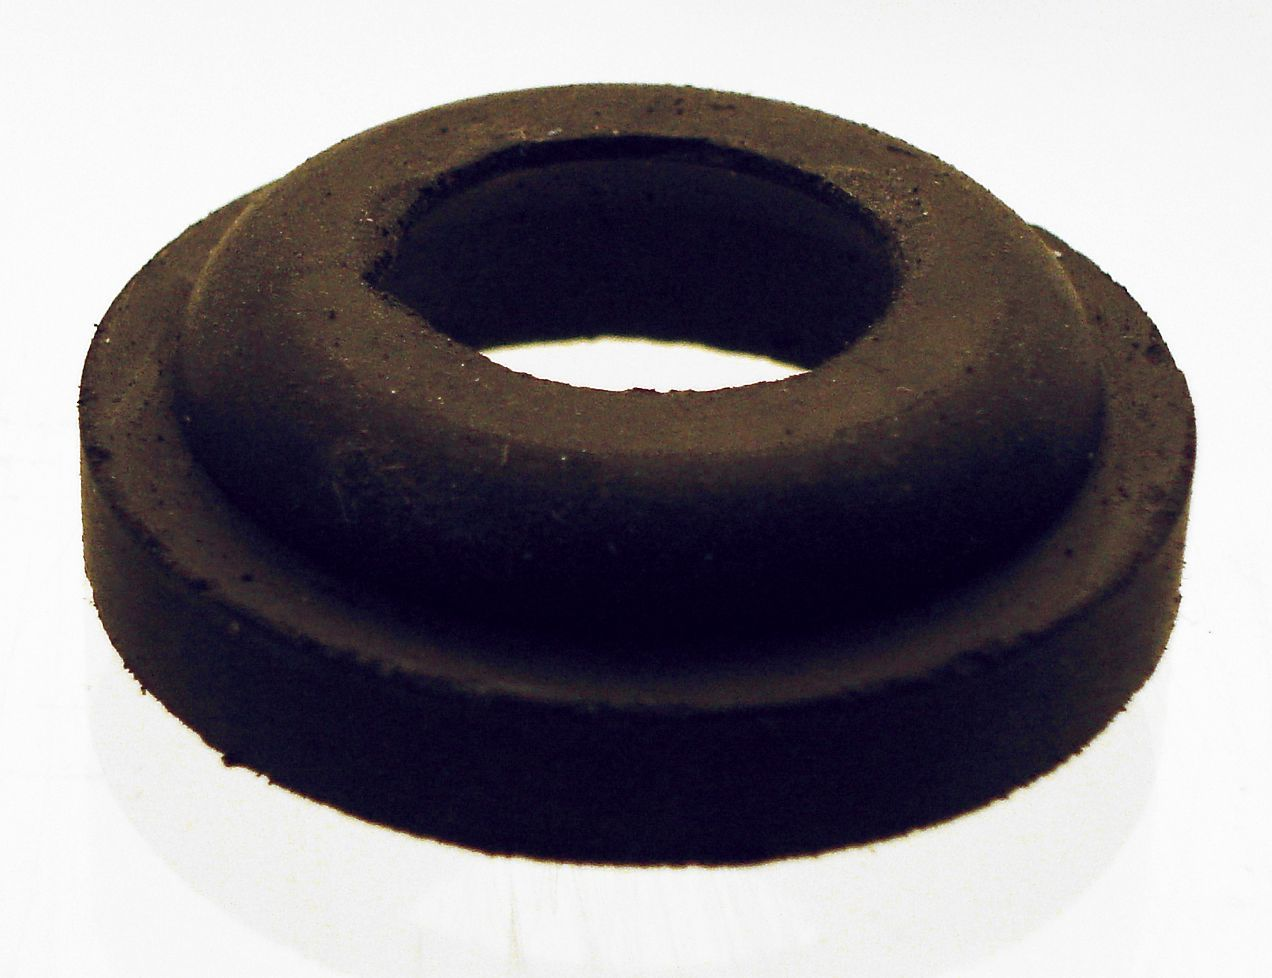 50 joints standard pour raccord express laiton tuyau arrosage ebay. Black Bedroom Furniture Sets. Home Design Ideas